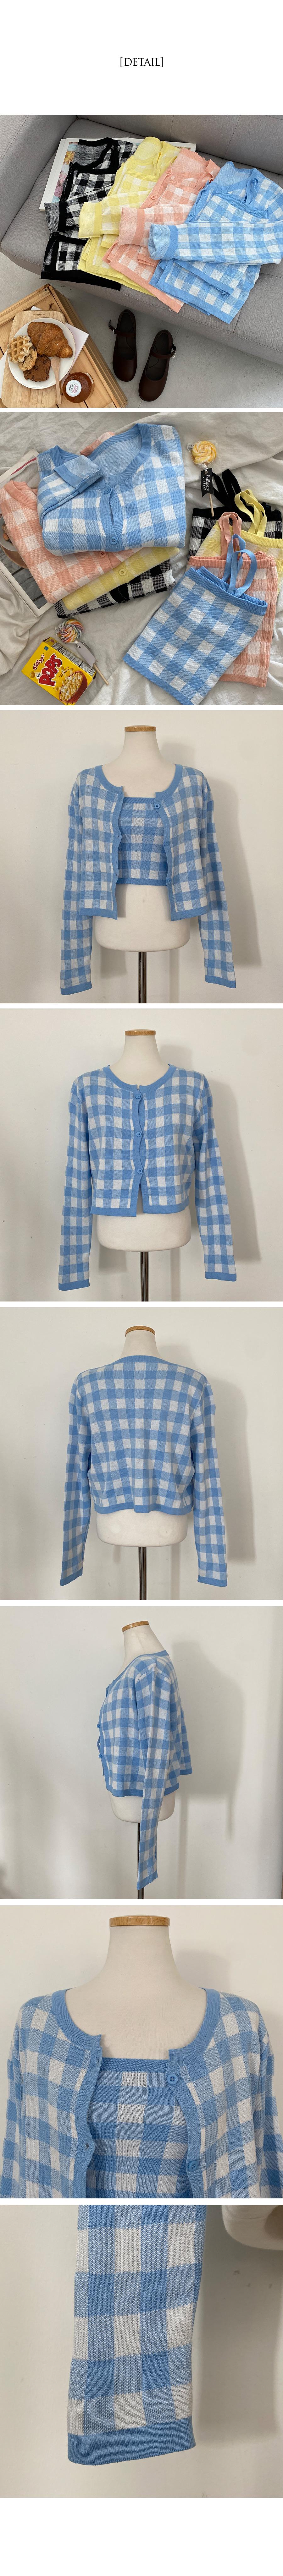 Water Check Sleeveless Cardigan Set